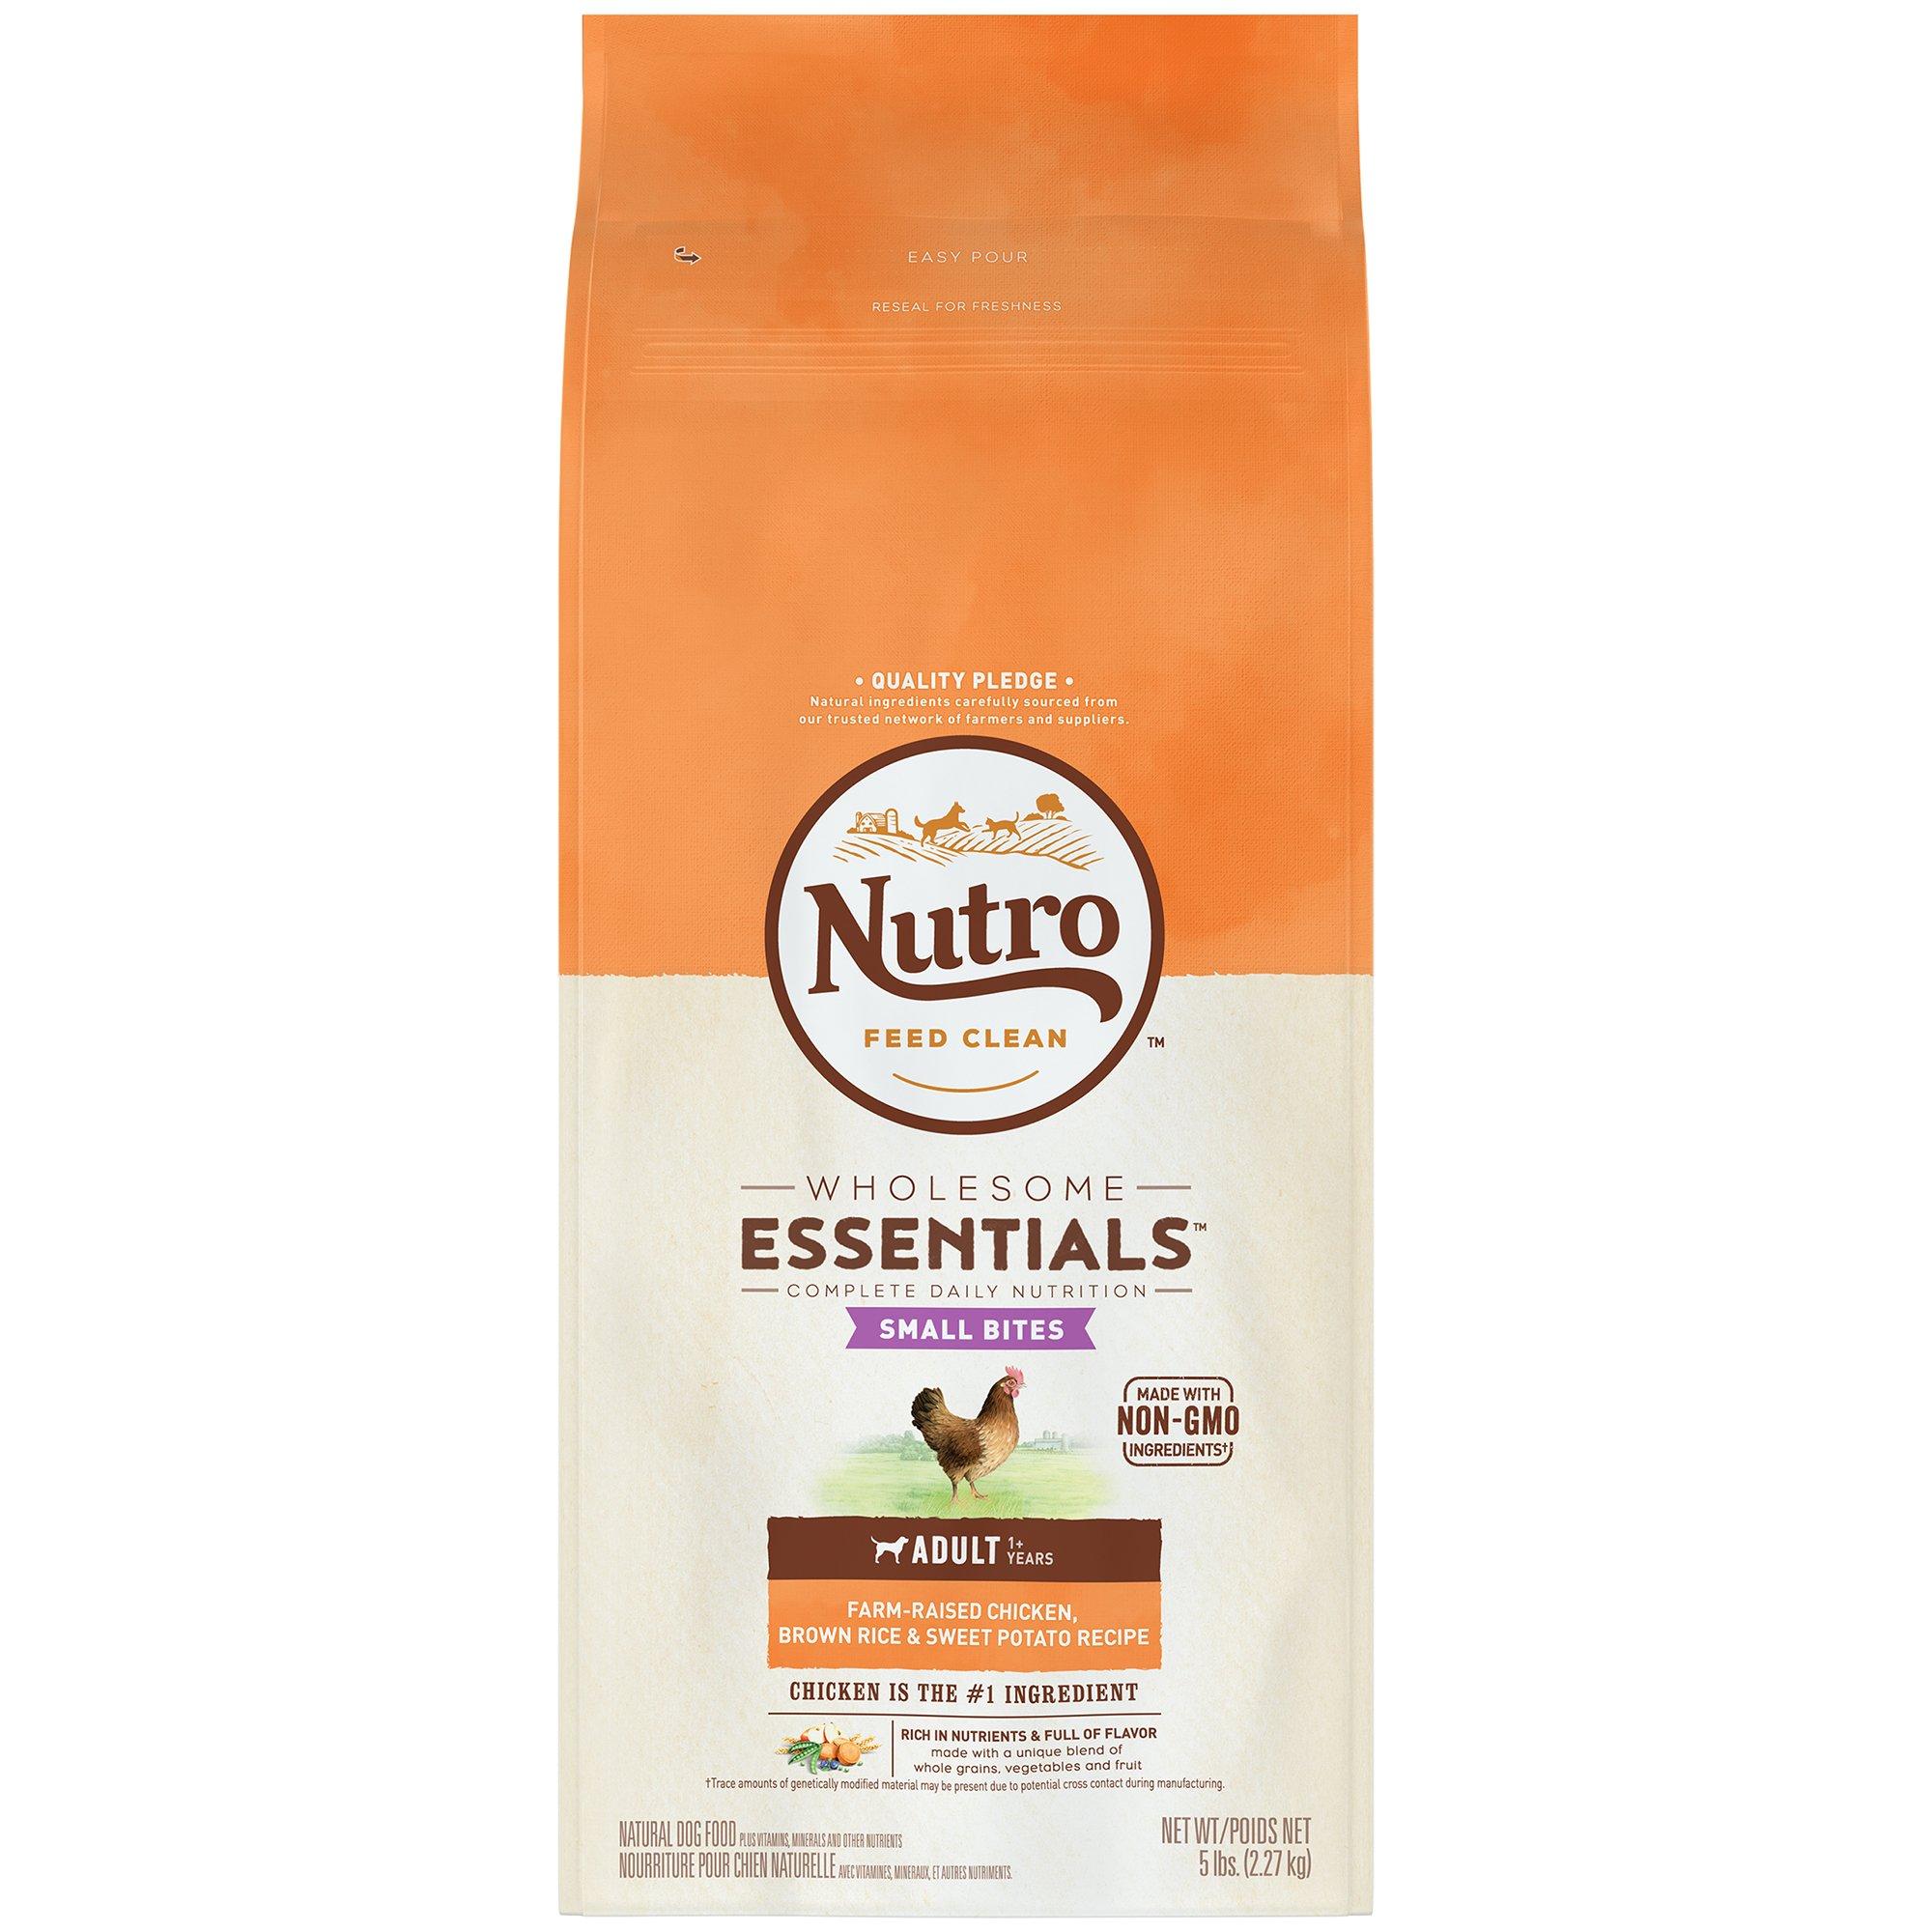 Amazon.com: Nutro WHOLESOME ESSENTIALS Adult Dry Dog Food